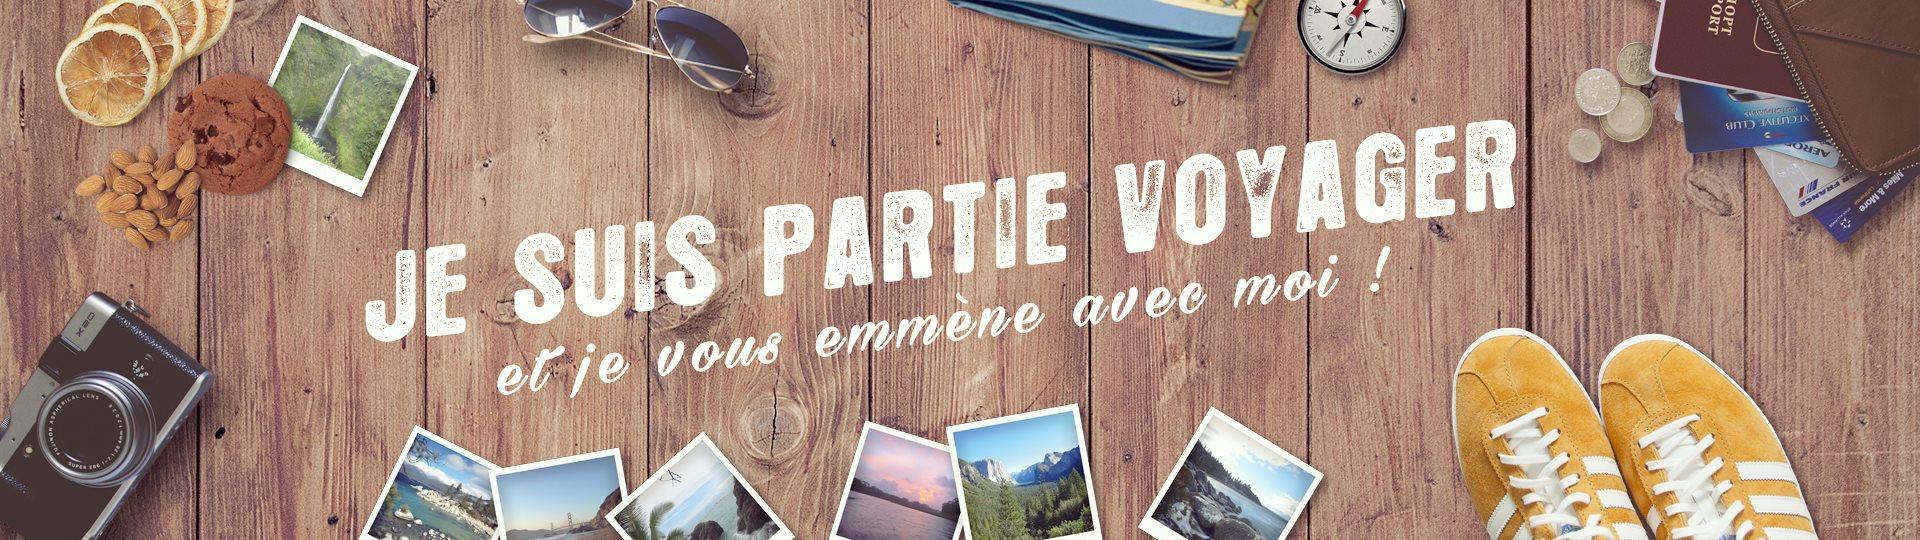 JSPV – Blog voyage ✈